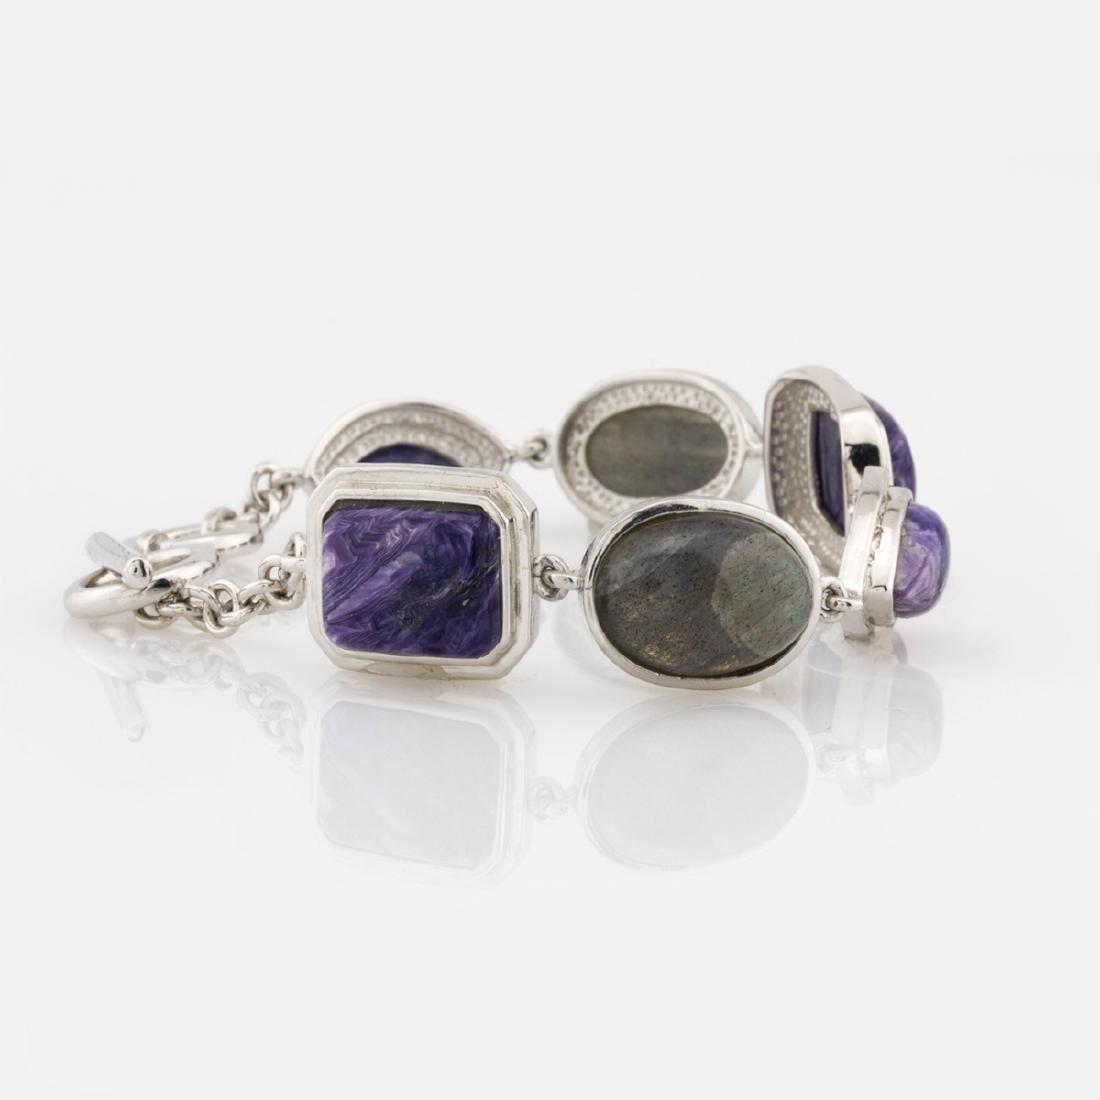 "Silver 7.5"" Charoite & Labradorite Toggle Bracelet"